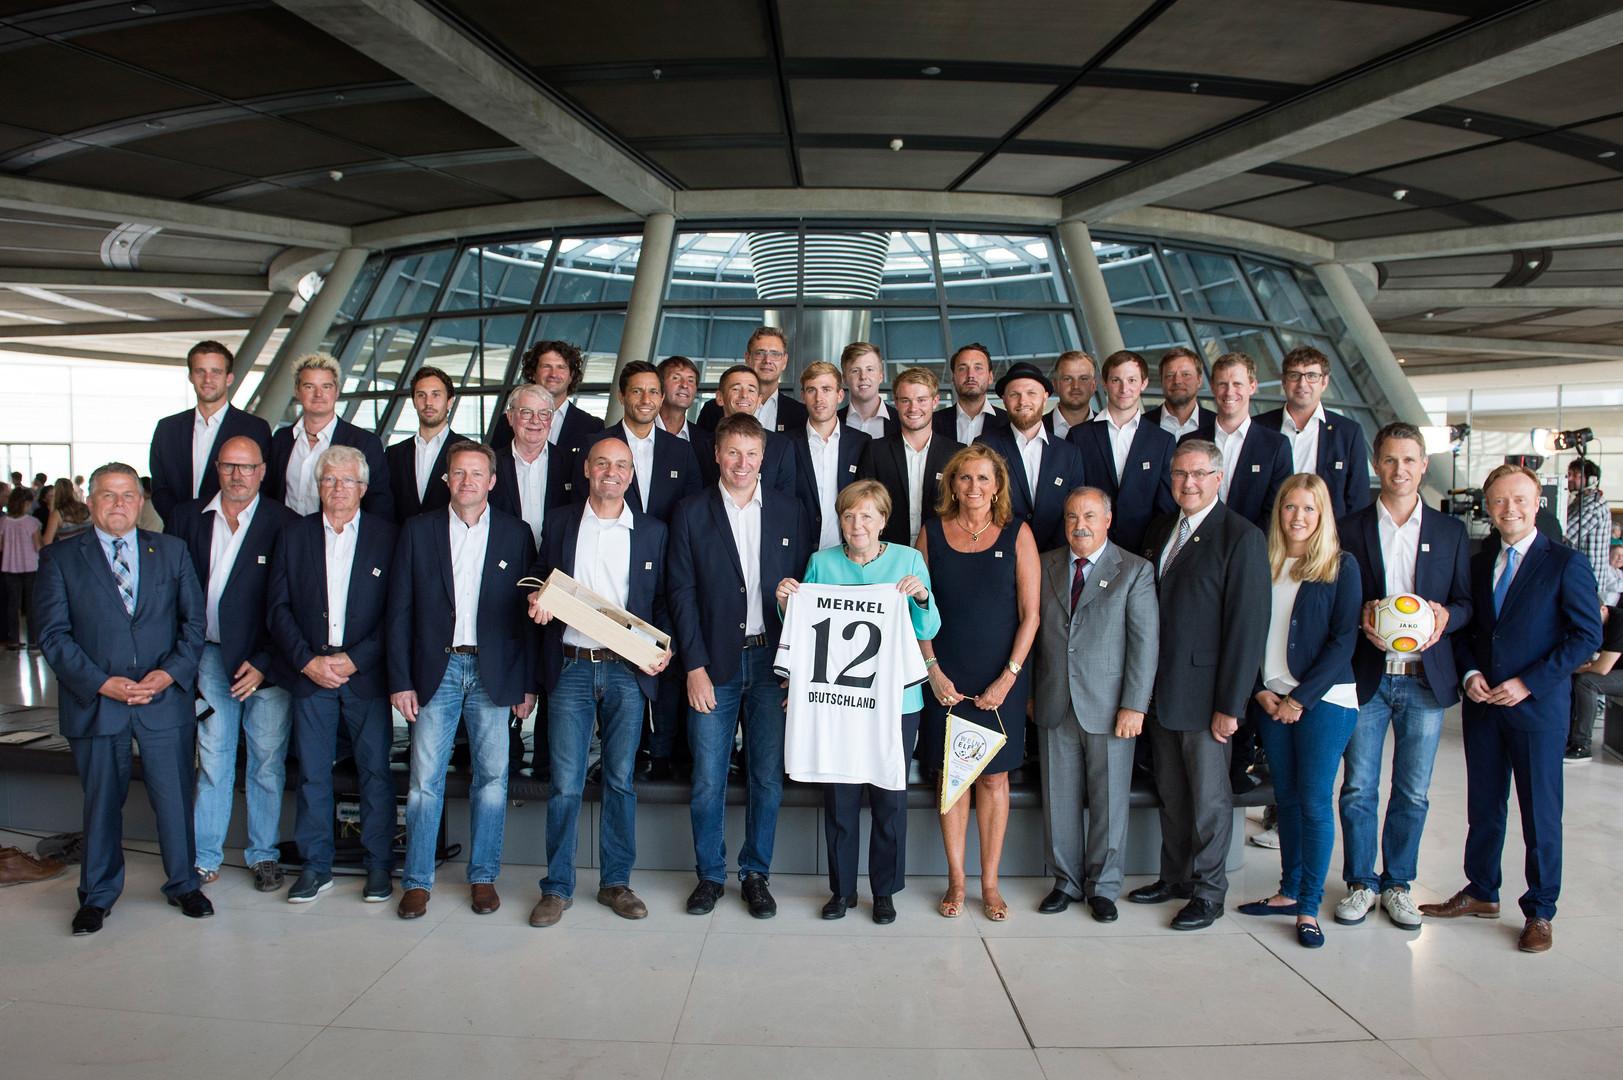 BERLIN-A. MERKEL 2017 (63 von 197).jpg